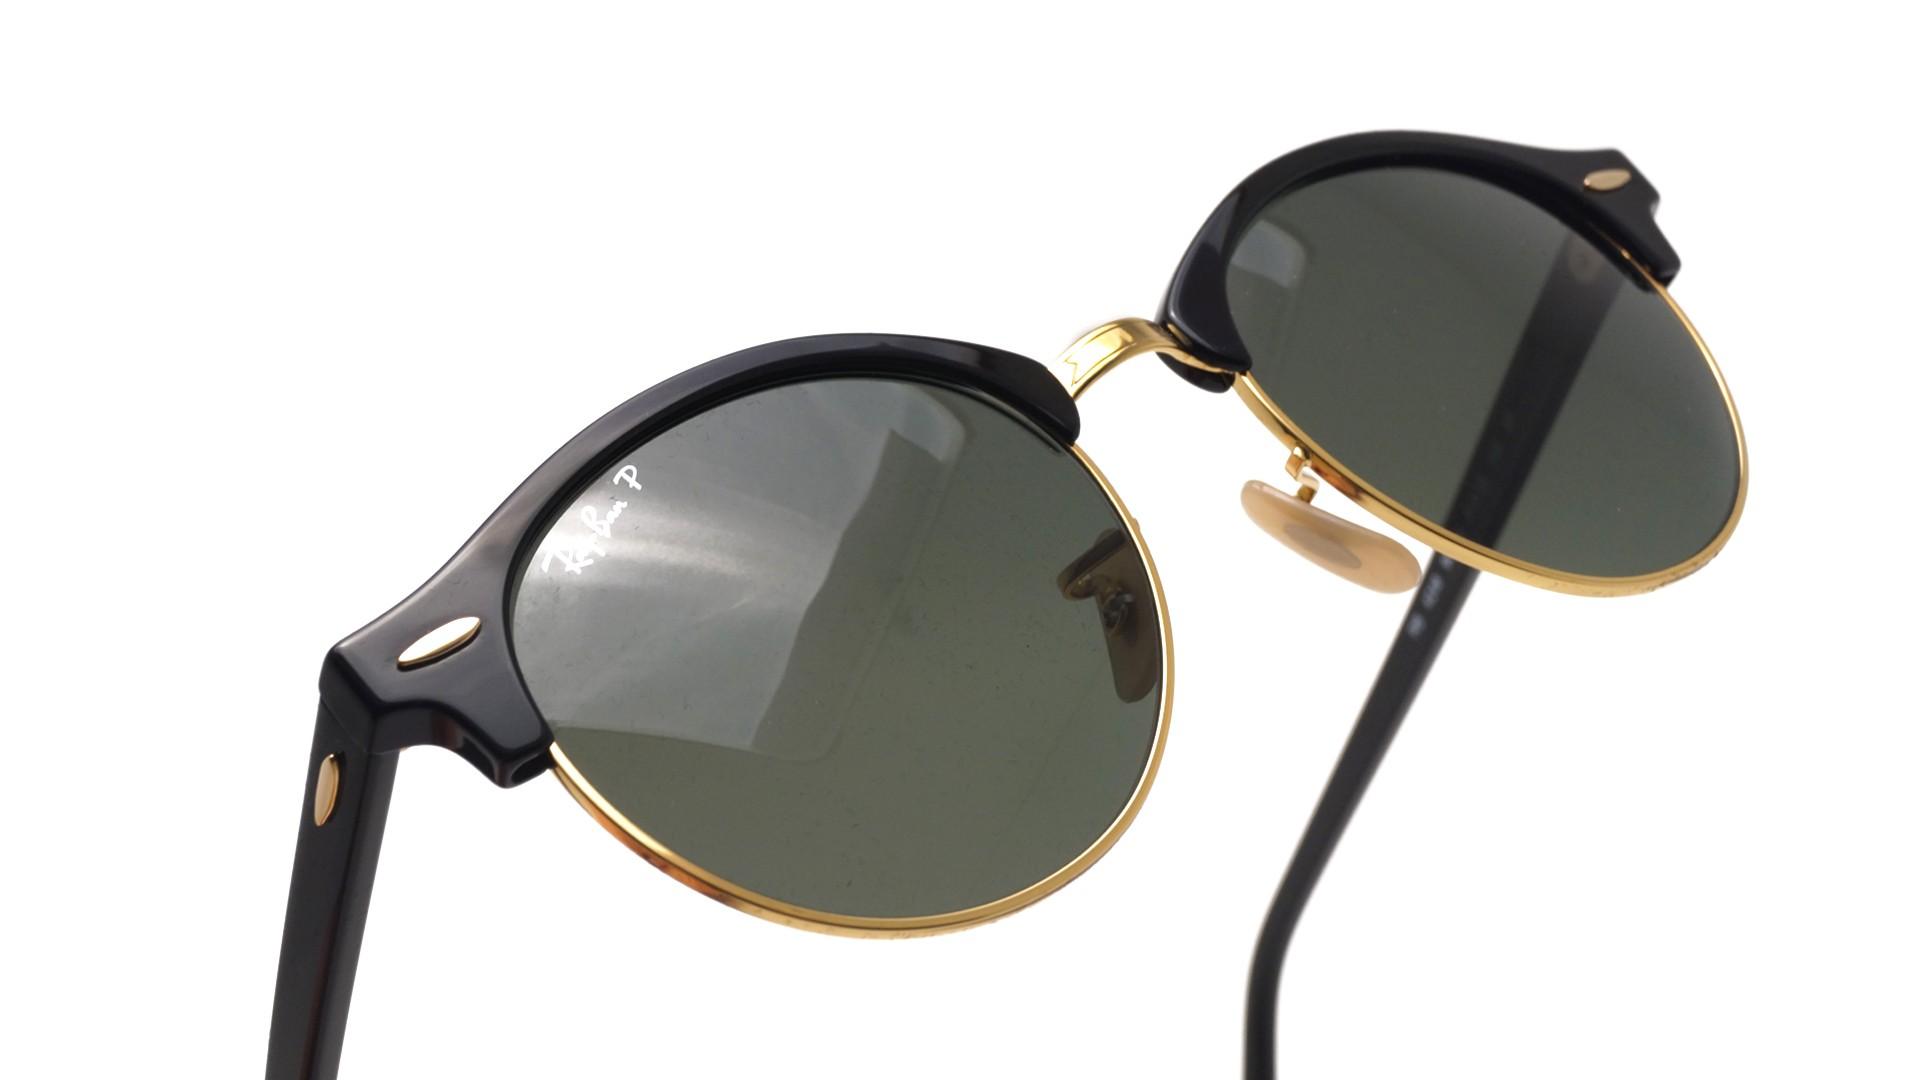 cfb2eb1015 Sunglasses Ray-Ban Clubround Black RB4246 901 58 51-19 Medium Polarized